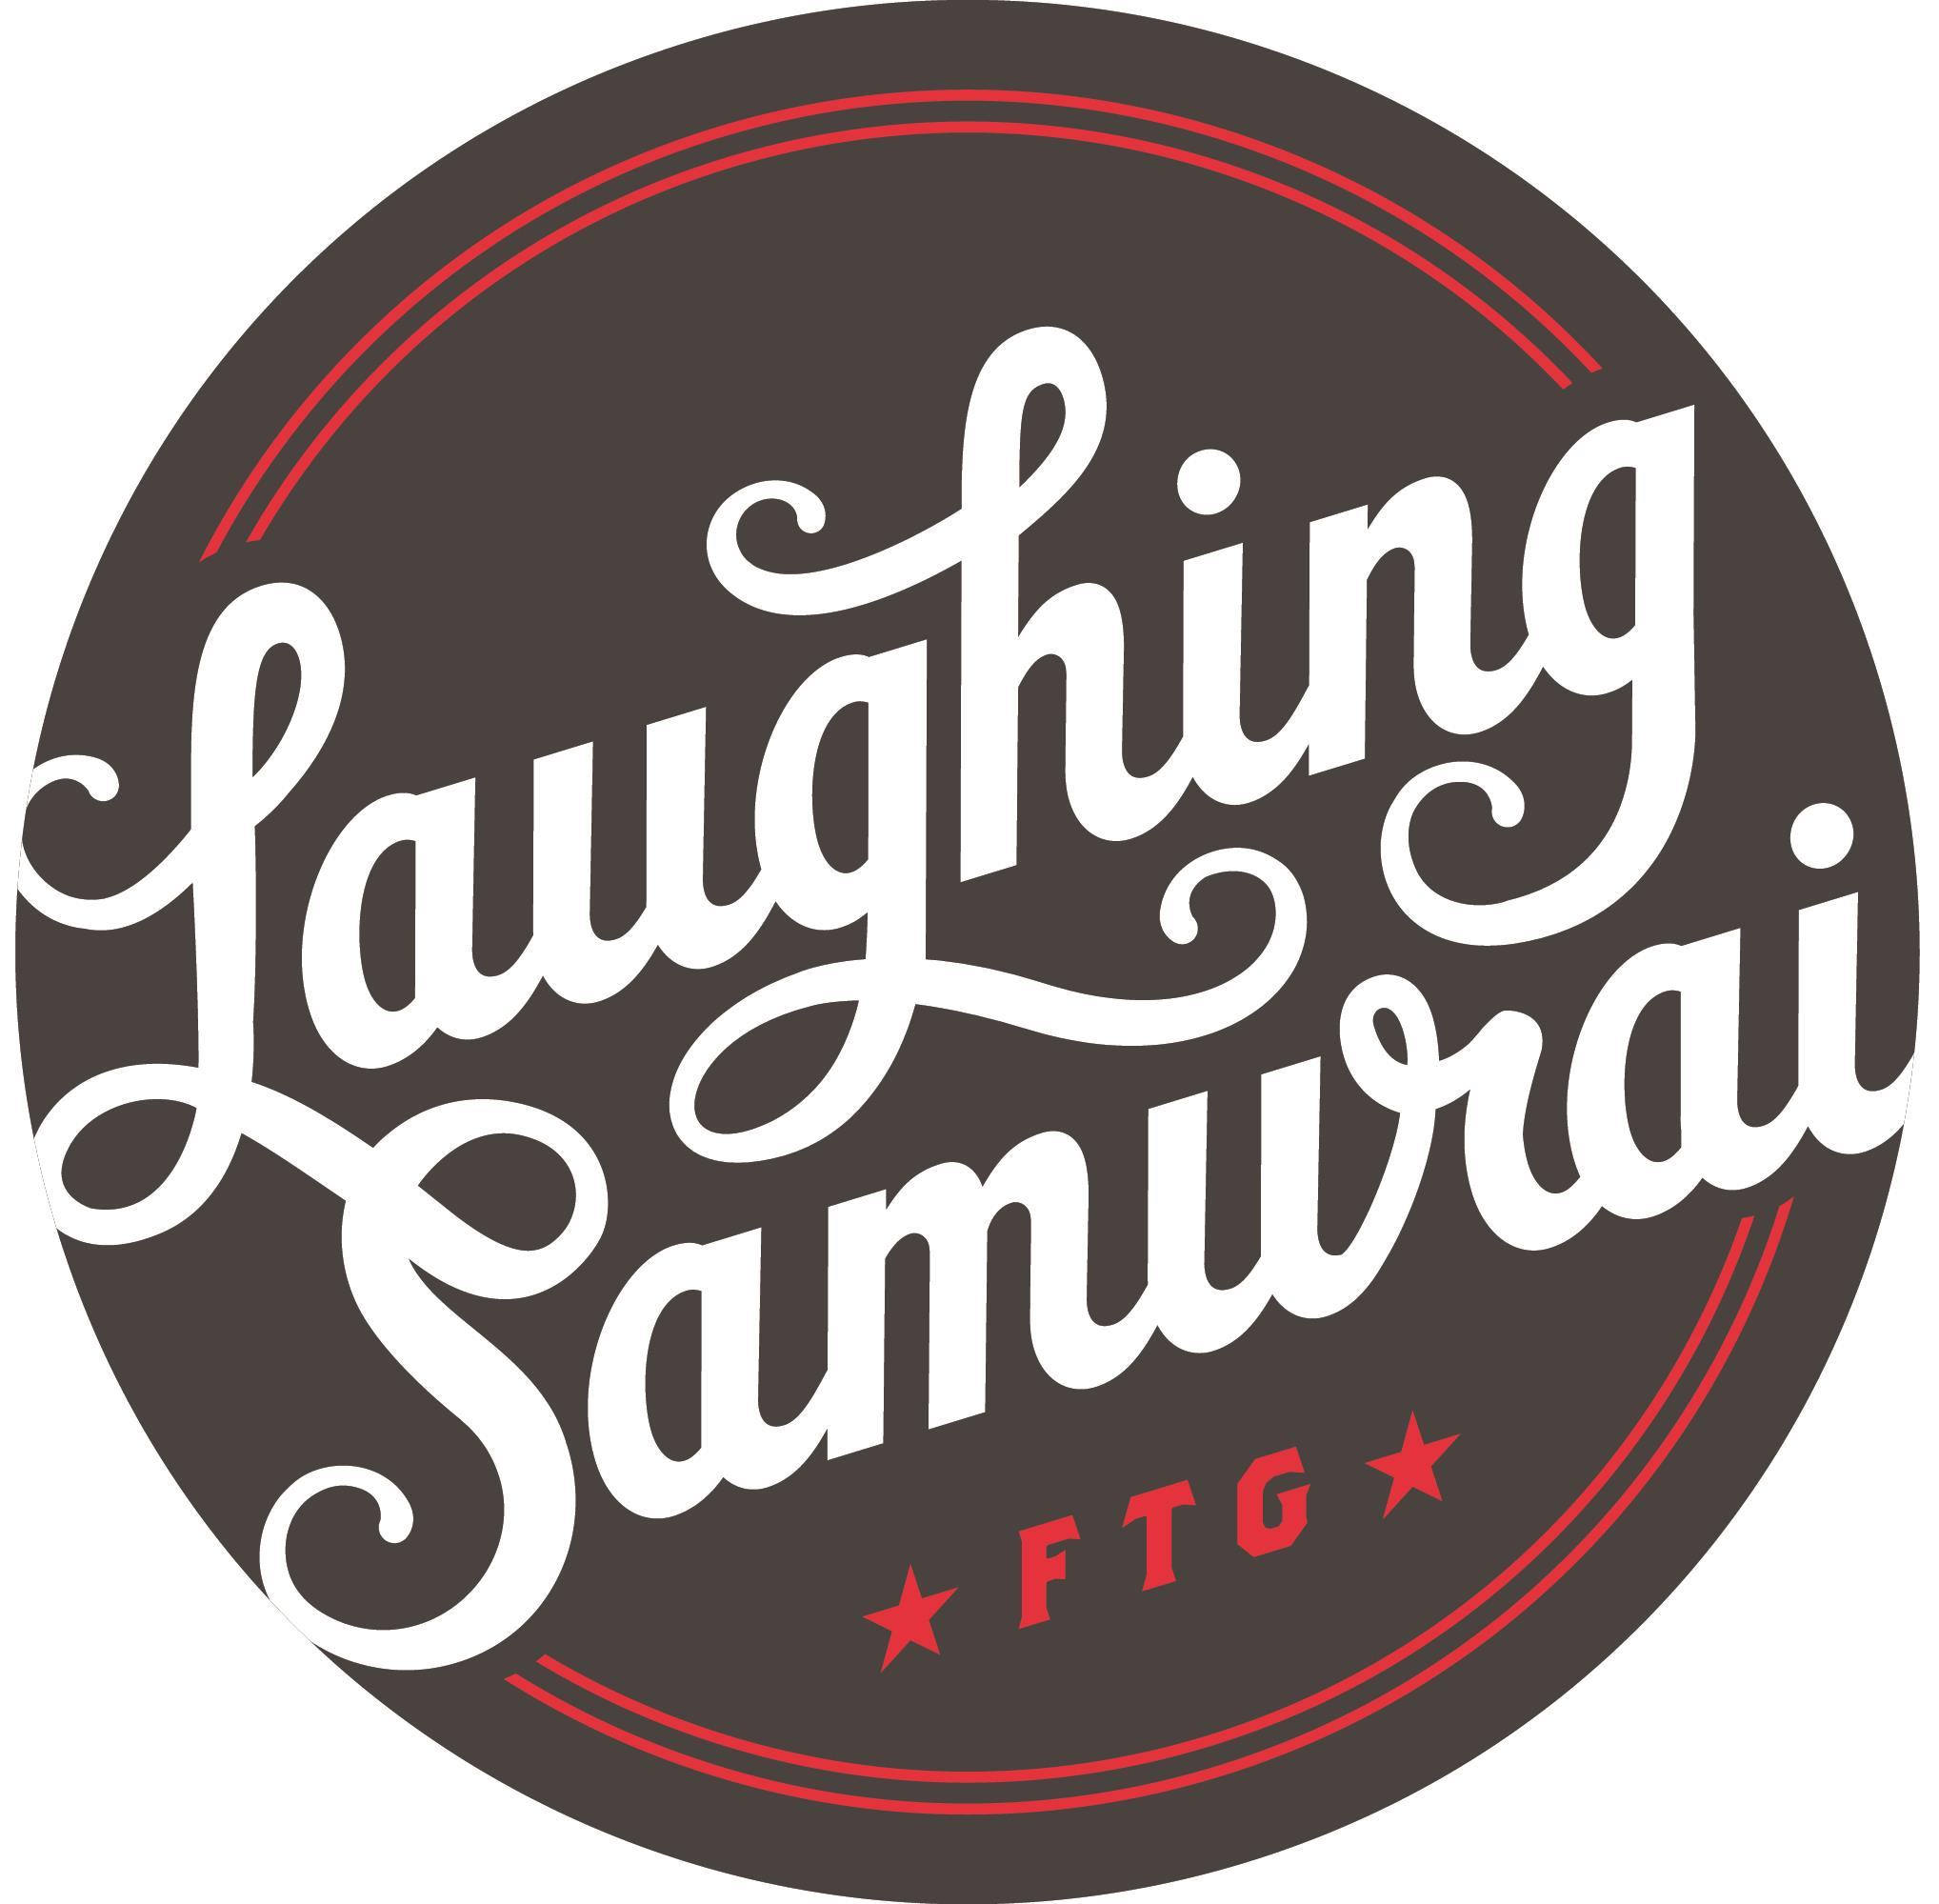 Laughing Samurai